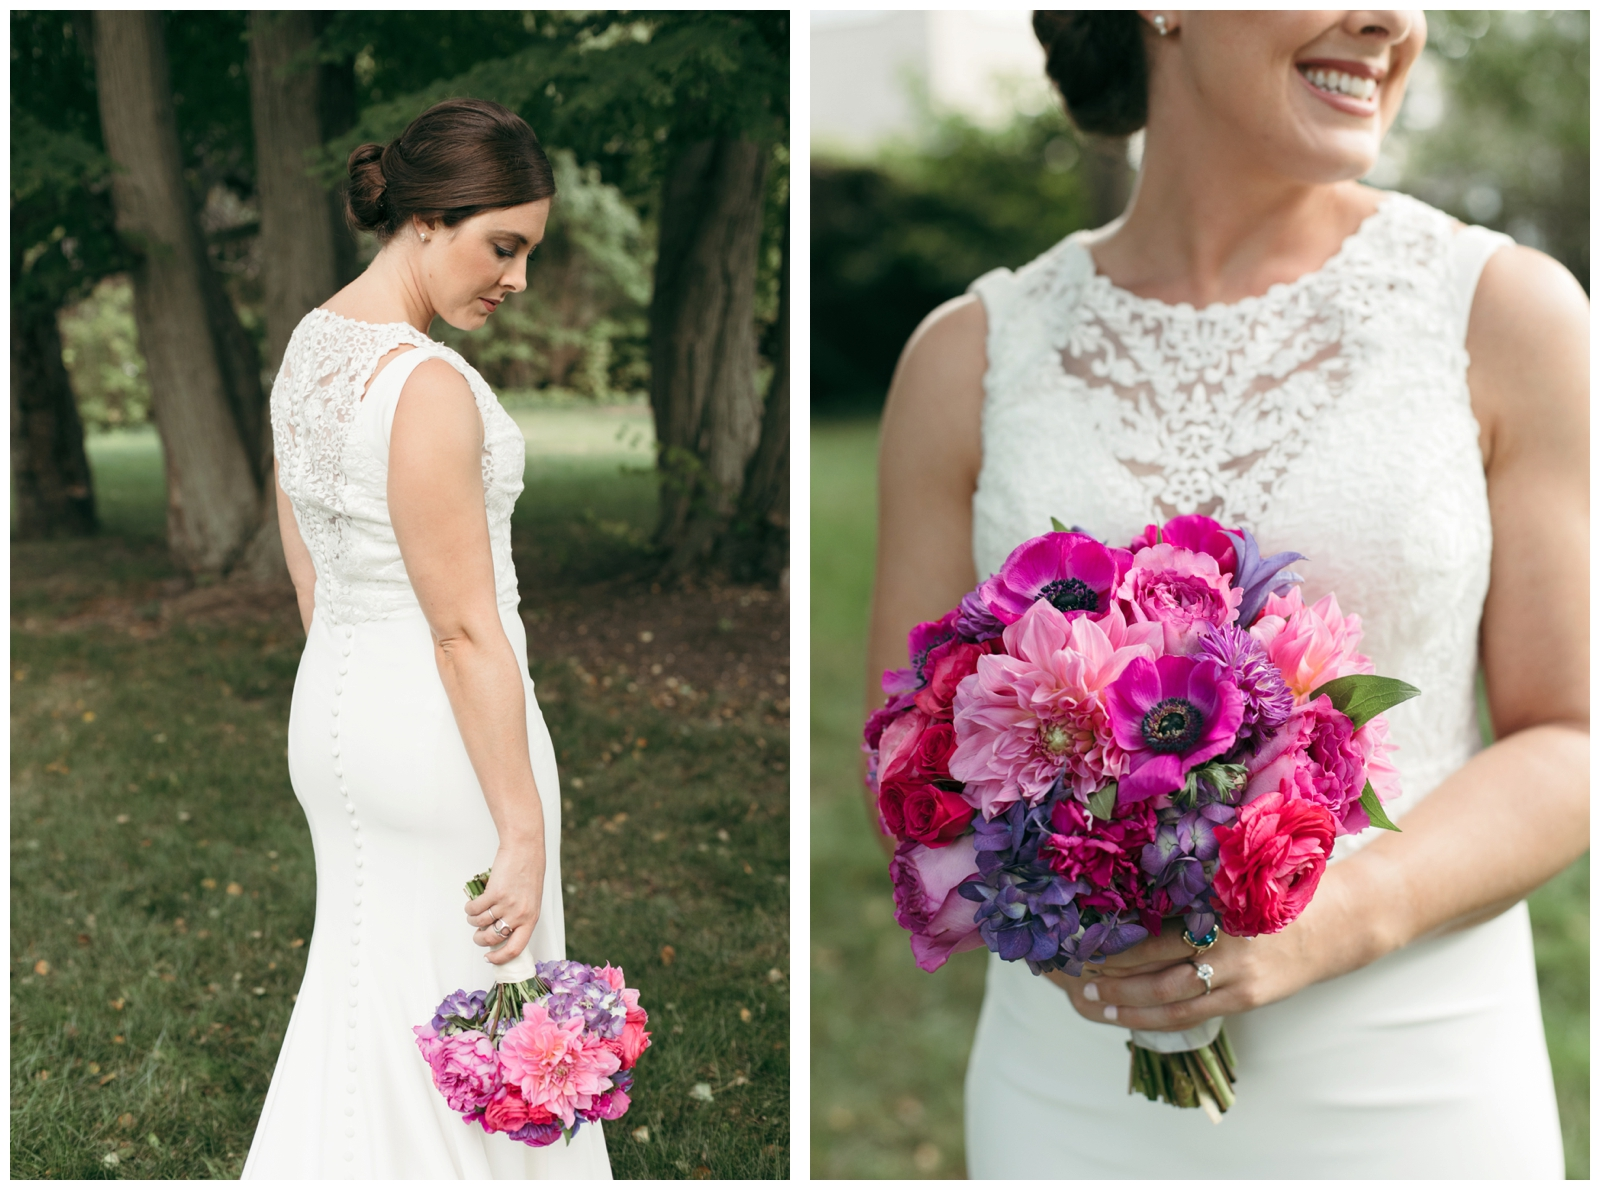 Bailey-Q-Photo-Backyard-Wedding-South-Shore-Boston-Wedding-Photographer-016.jpg